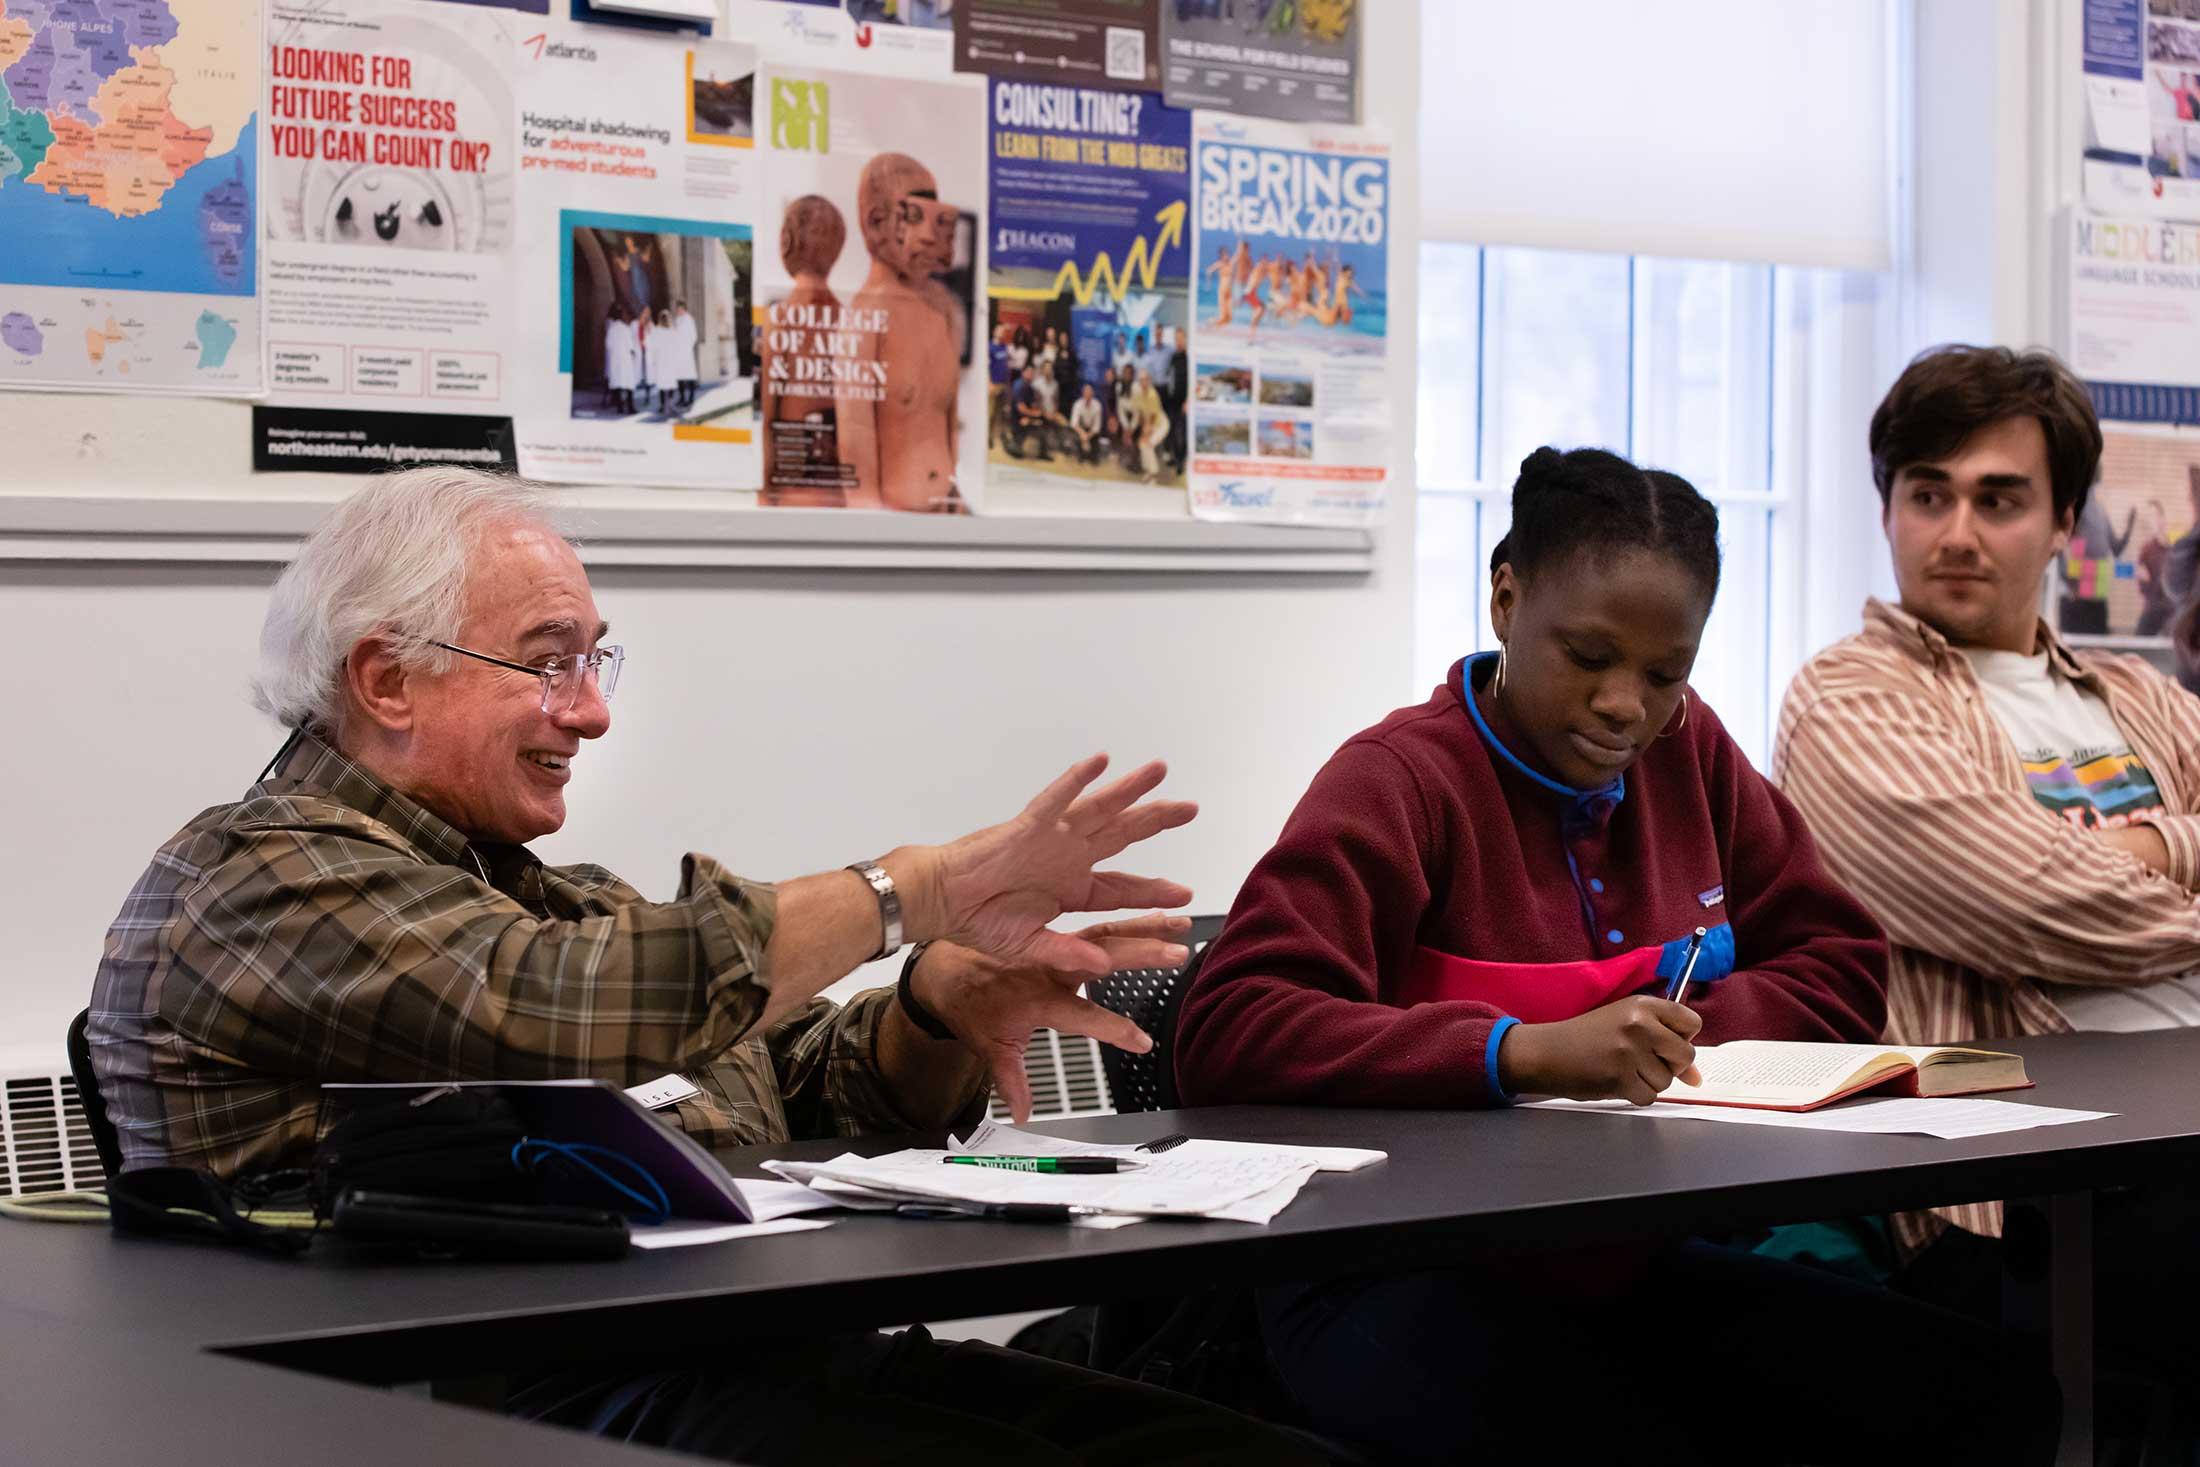 An alumni participating in Professor Sanborn's literature class